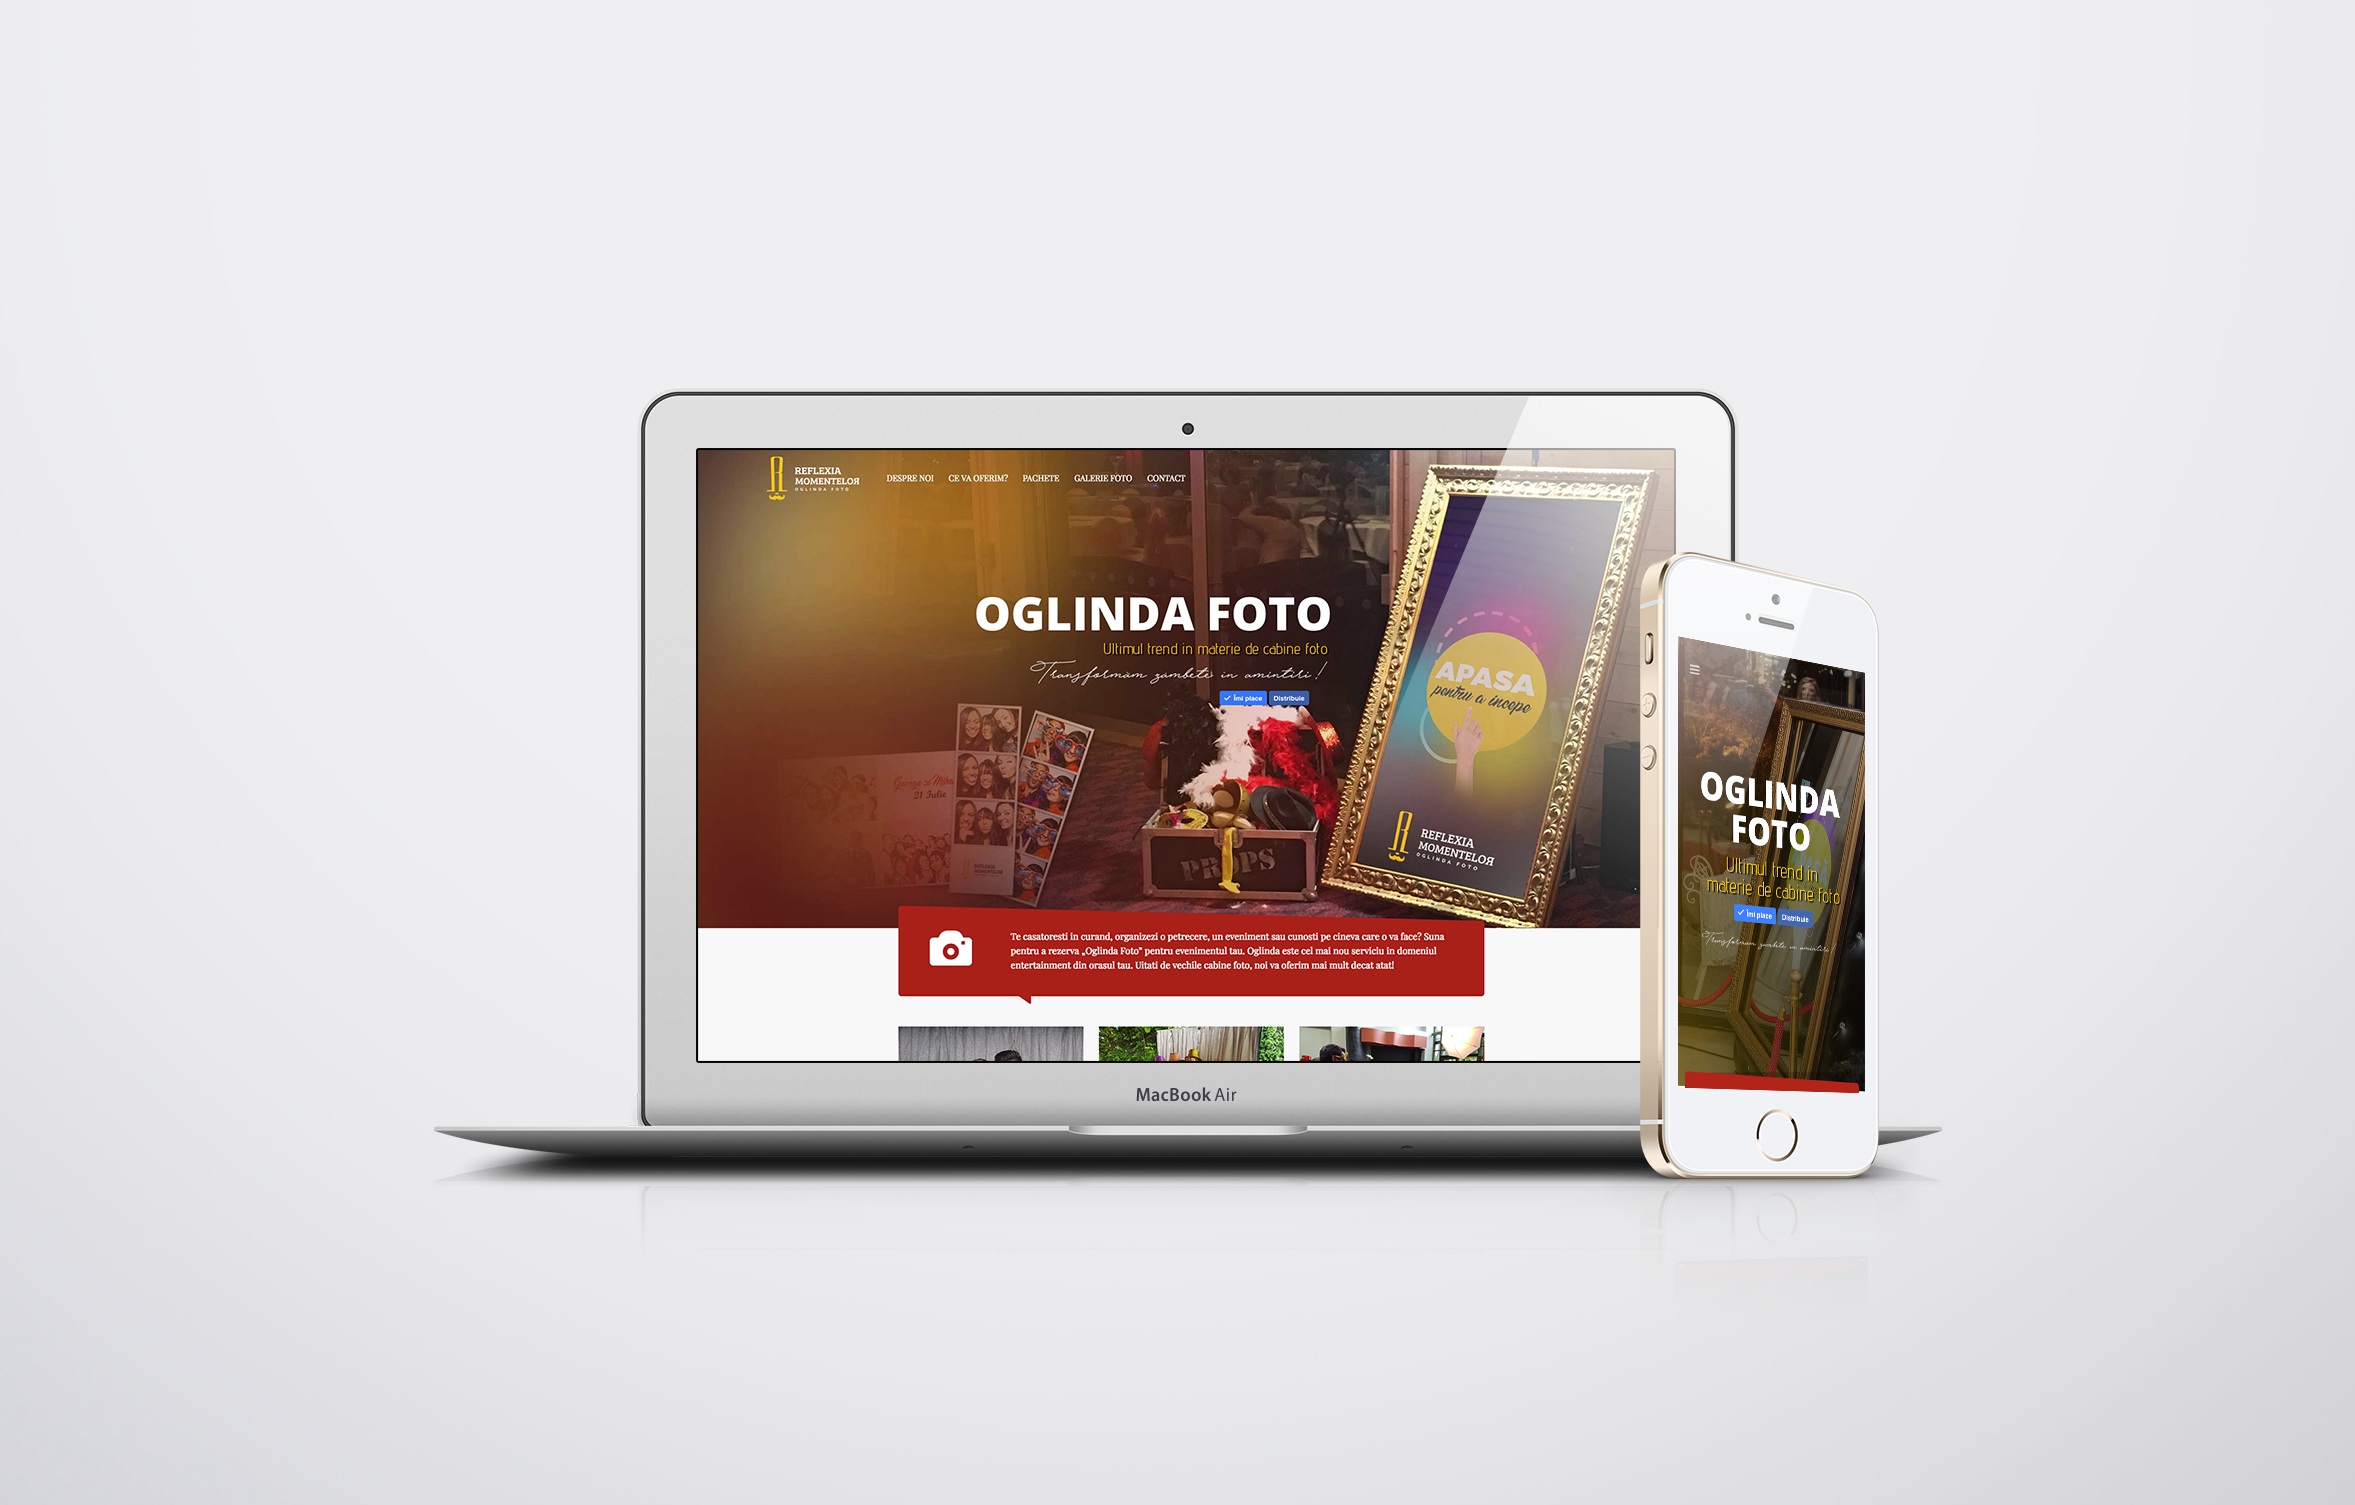 creare site botosani, realizare site botosani, creare website botosani, realizare website botosani